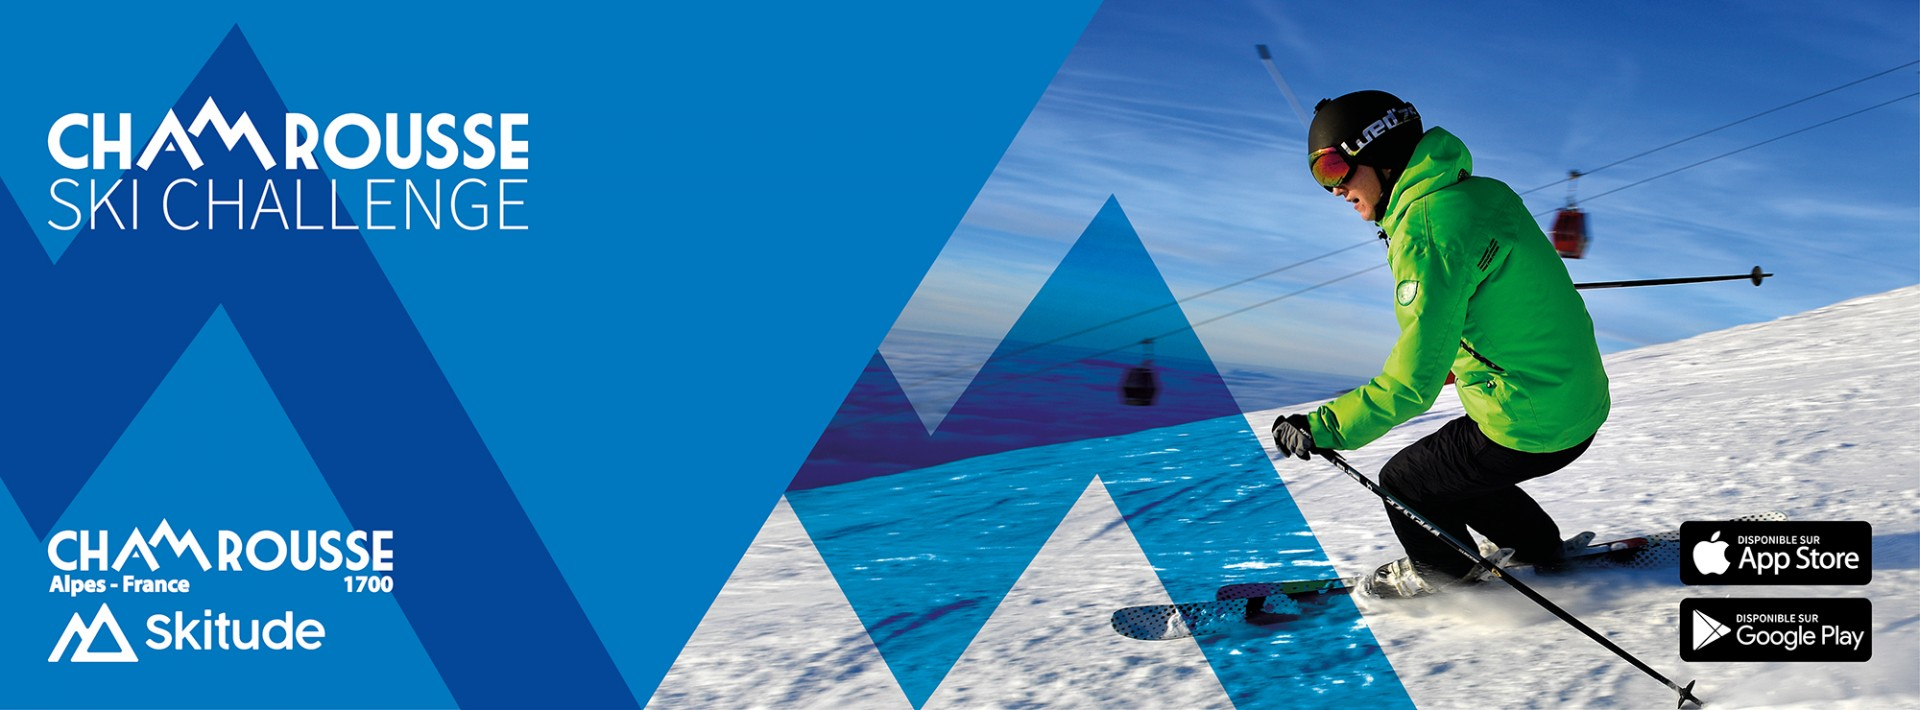 Chamrousse ski challenge